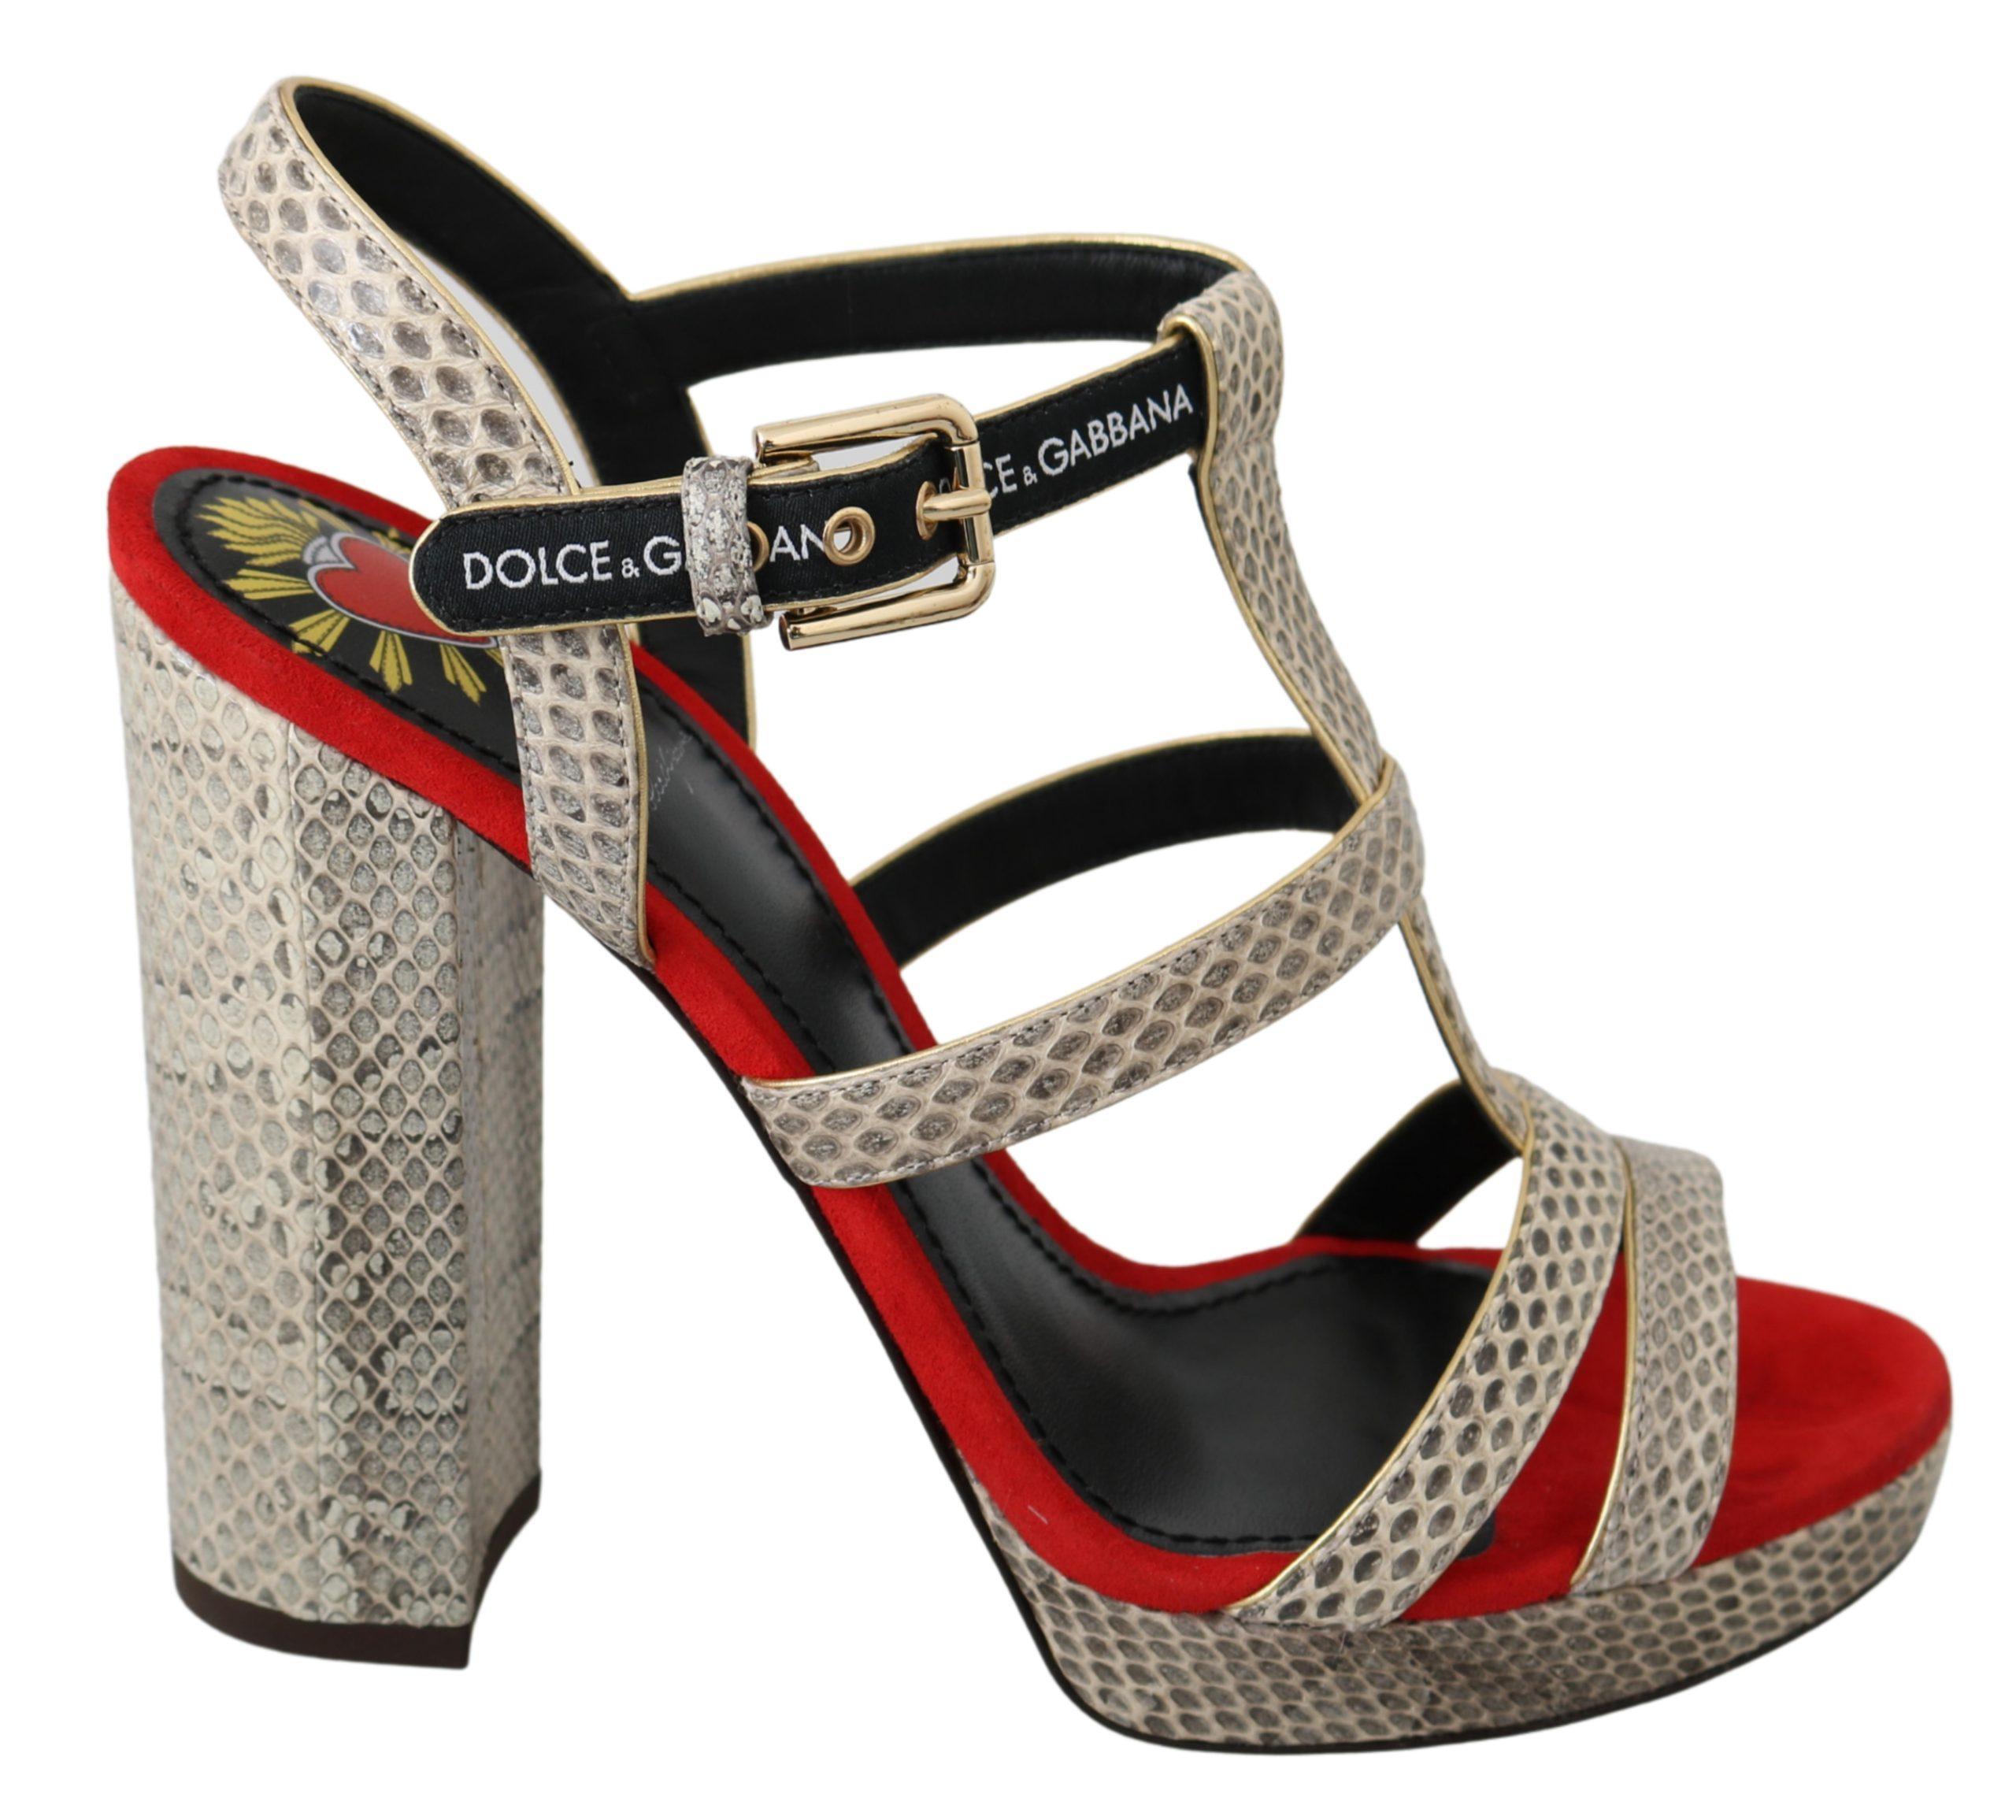 Dolce & Gabbana Women's Ayers Leather Heels Sandals Shoes Beige LA6575 - EU35/US4.5